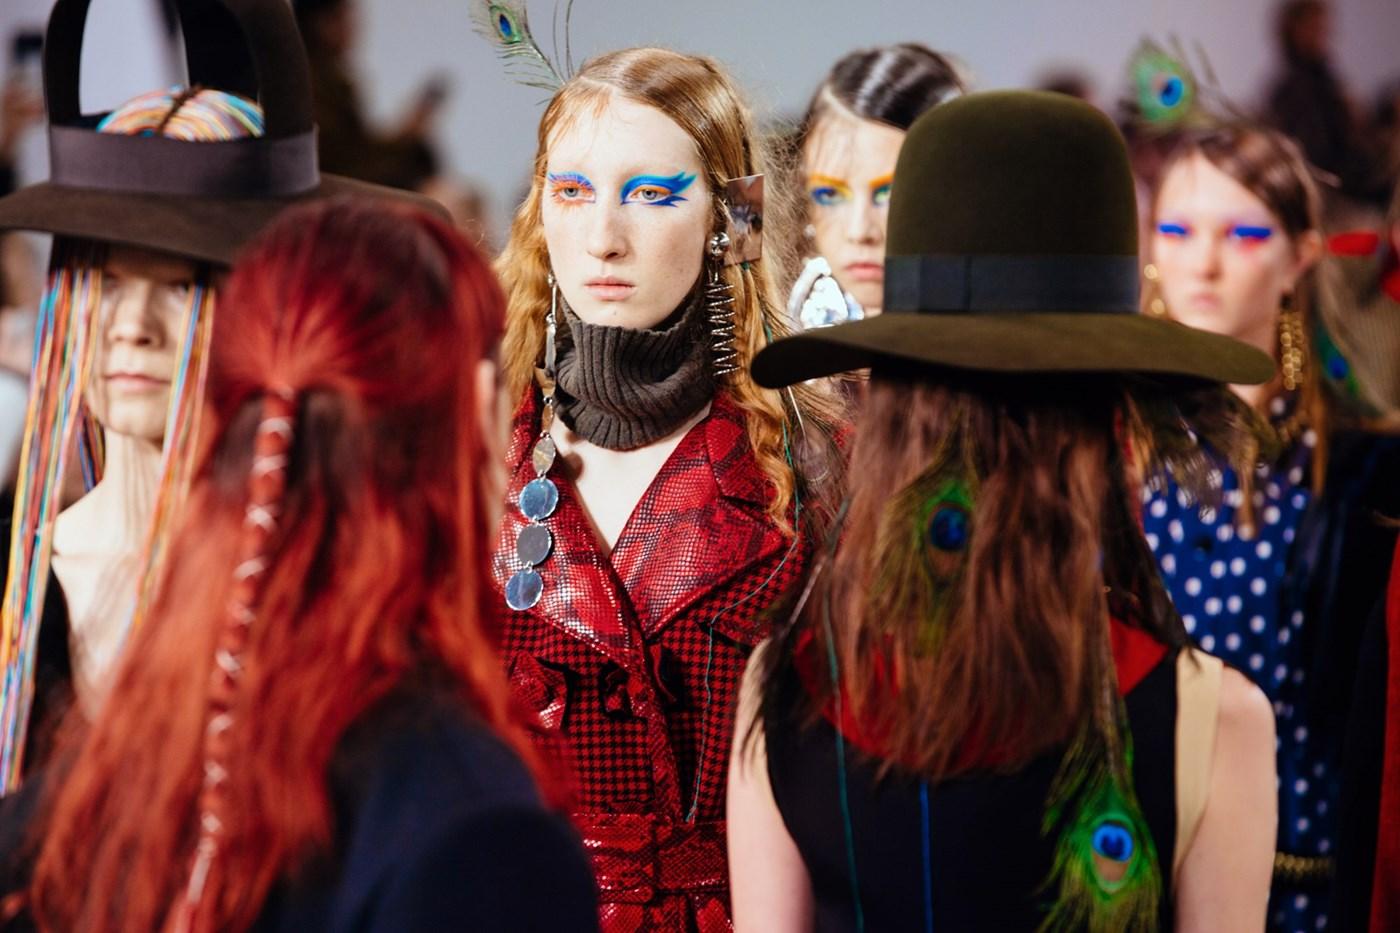 maison margiela, show, desfile, pfw, paris fashion week, make up, maquiagem, colorida